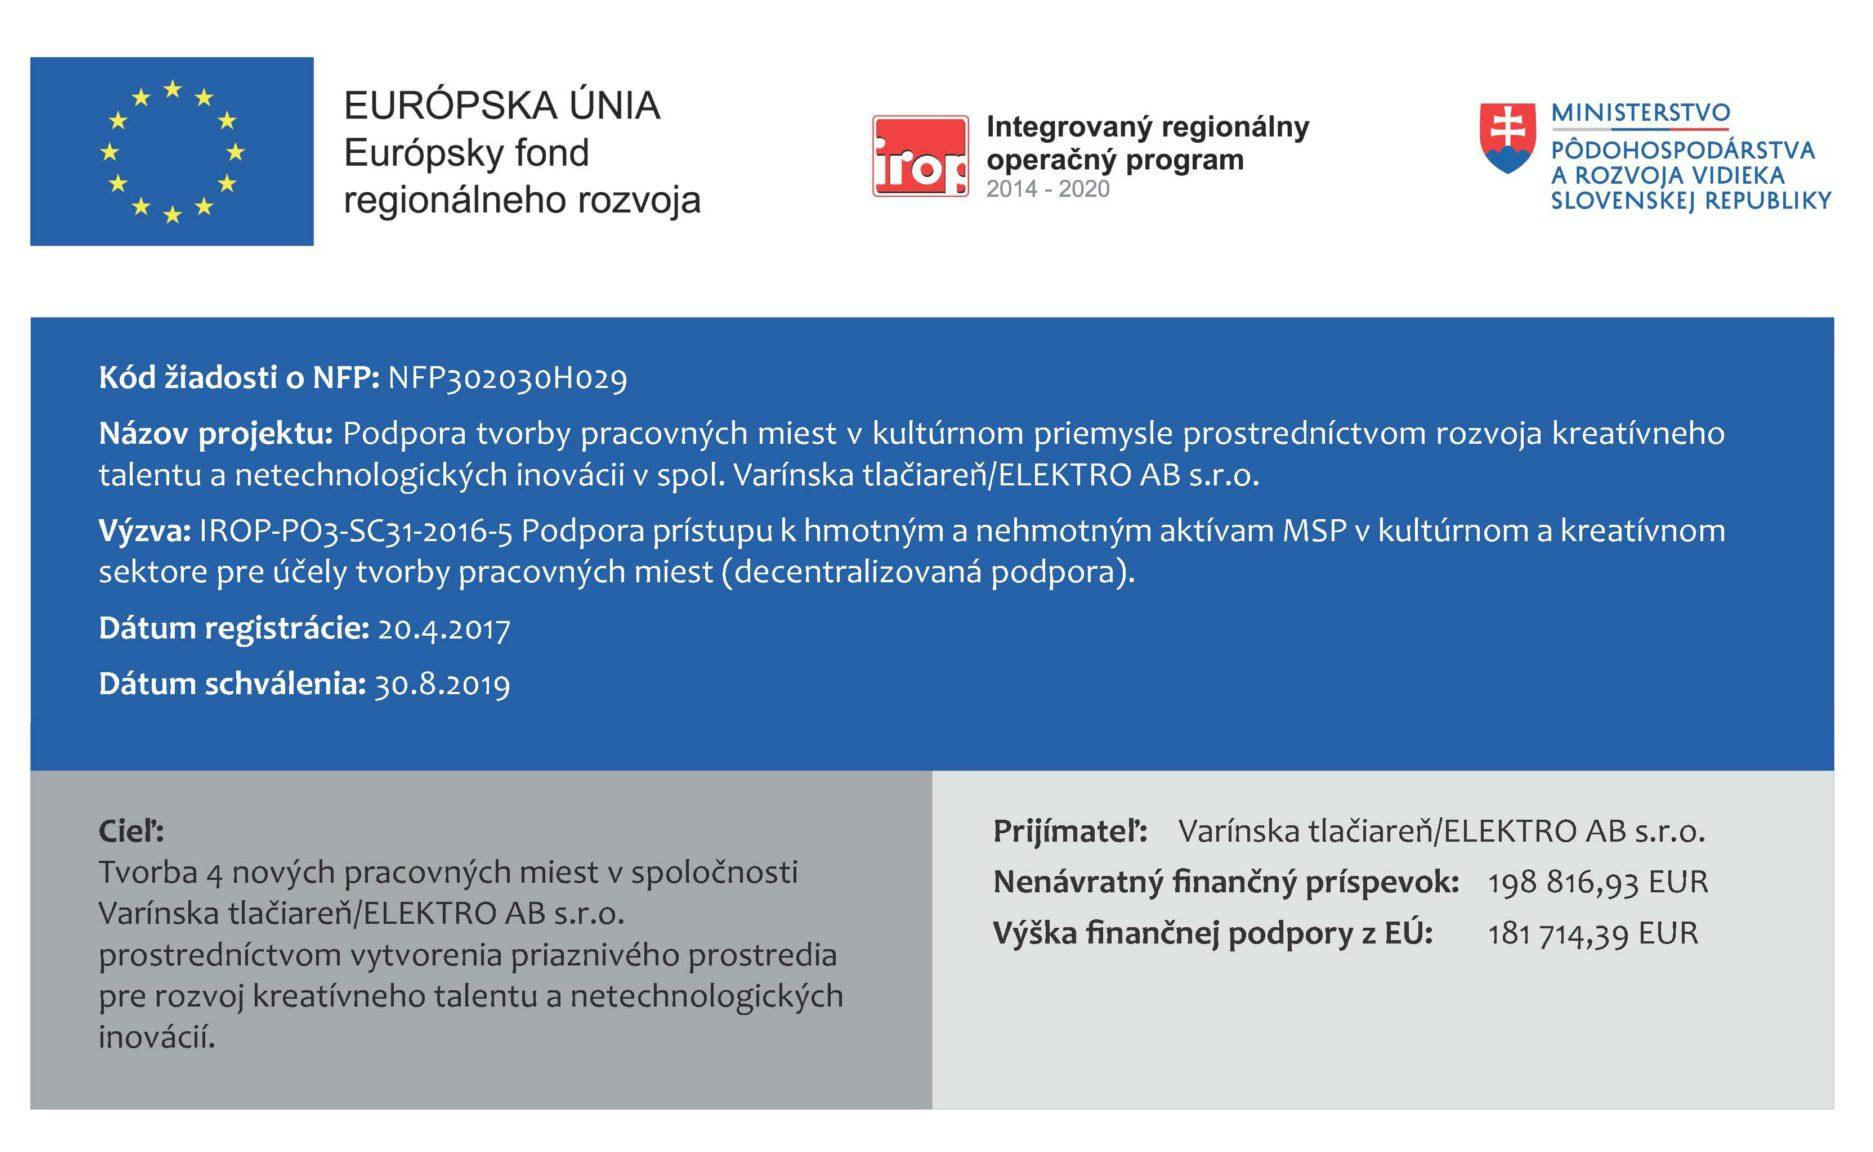 http://www.varinskatlaciaren.sk/wp-content/uploads/2020/05/podpora-Varinska-e1589375066400.jpg